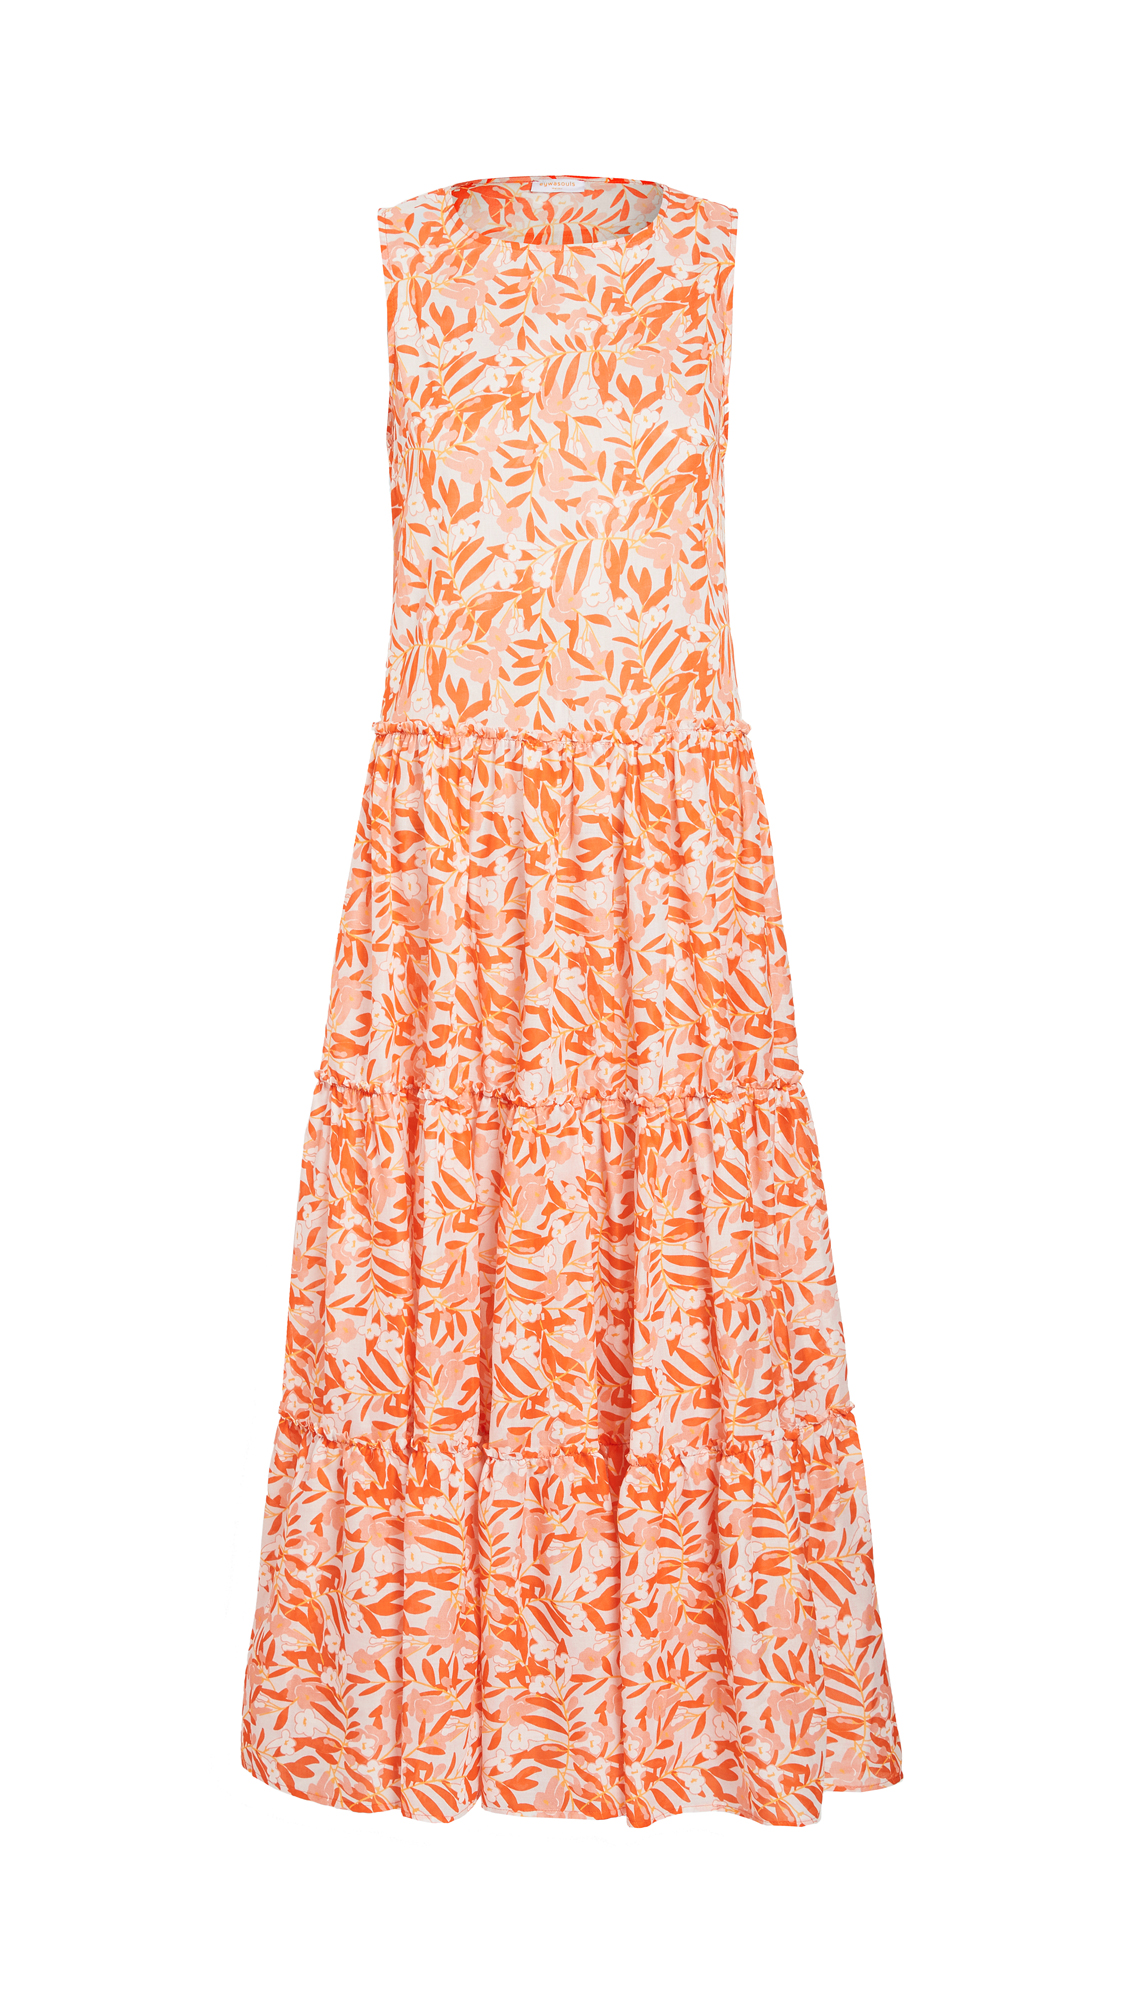 Eywasouls Malibu Lisa Dress